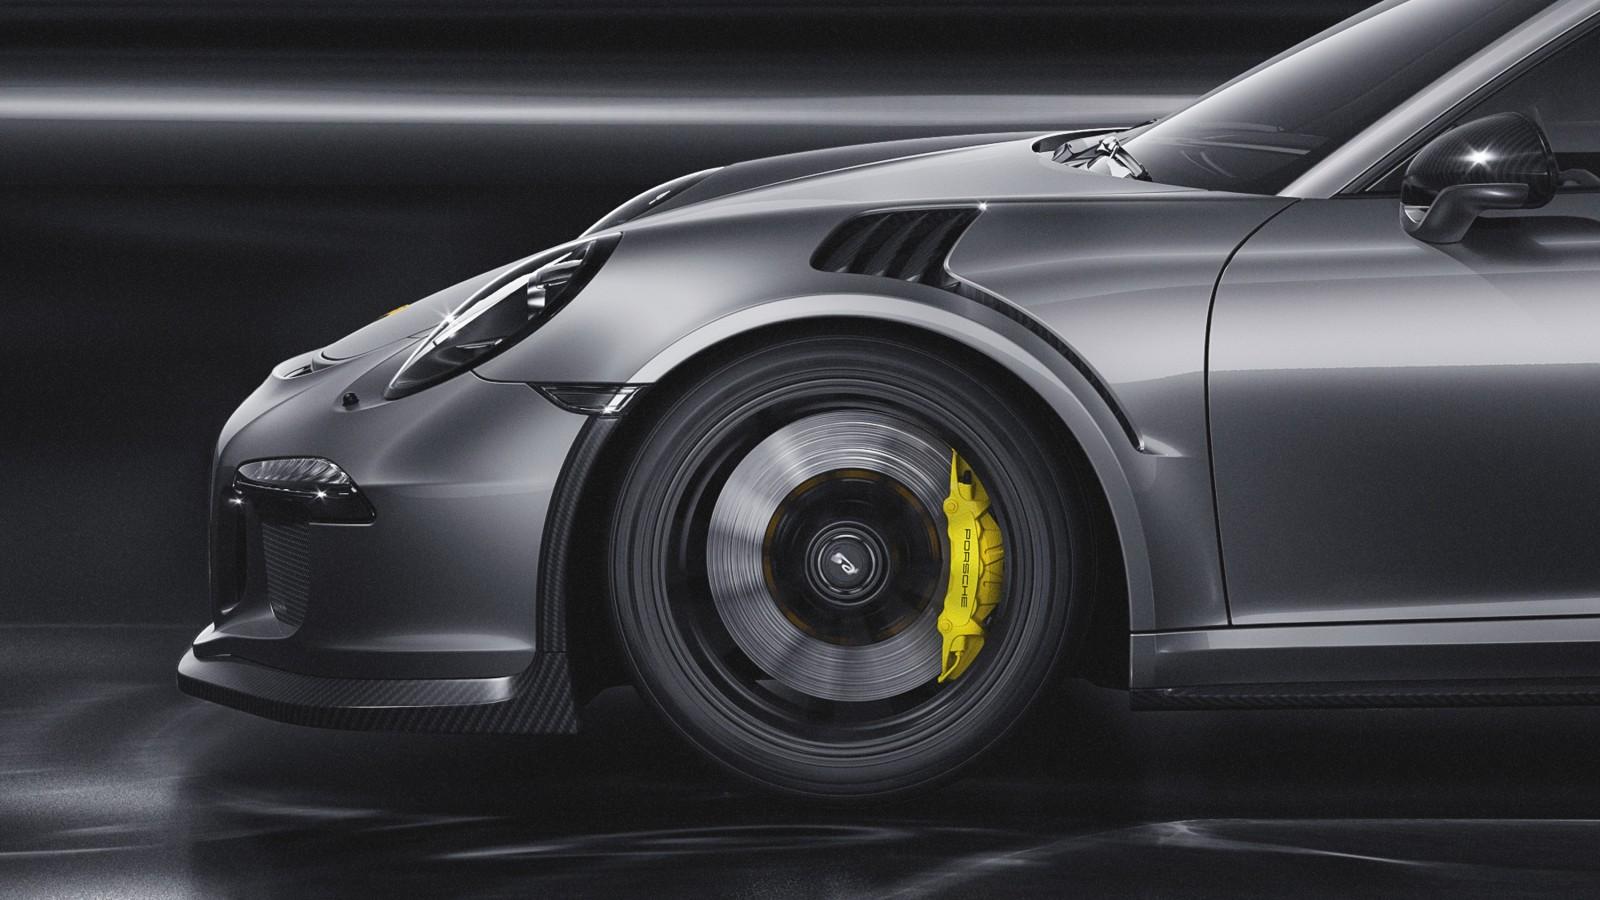 Hummer Car Wallpapers 2013 Porsche 911 Gt3 Rs Cgi Wallpaper Hd Car Wallpapers Id